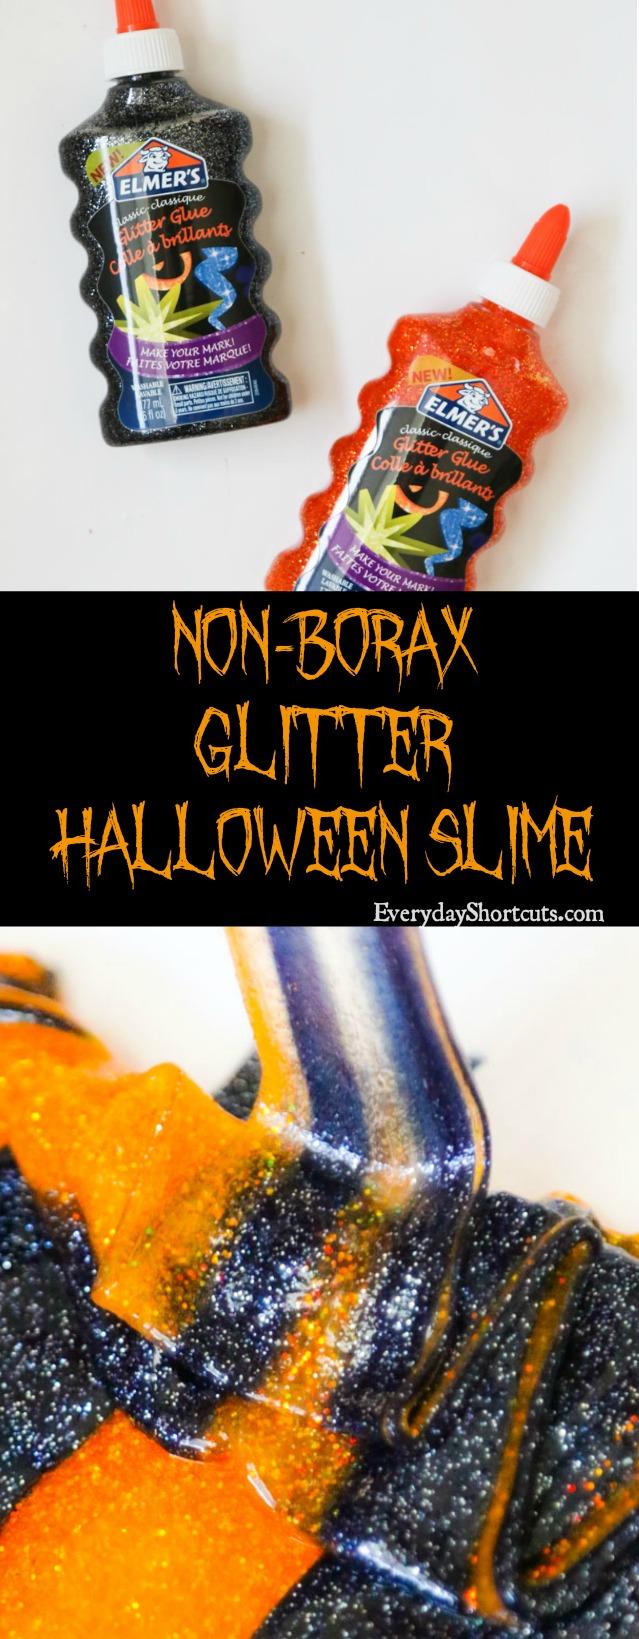 how-to-make-non-borax-glitter-halloween-slime